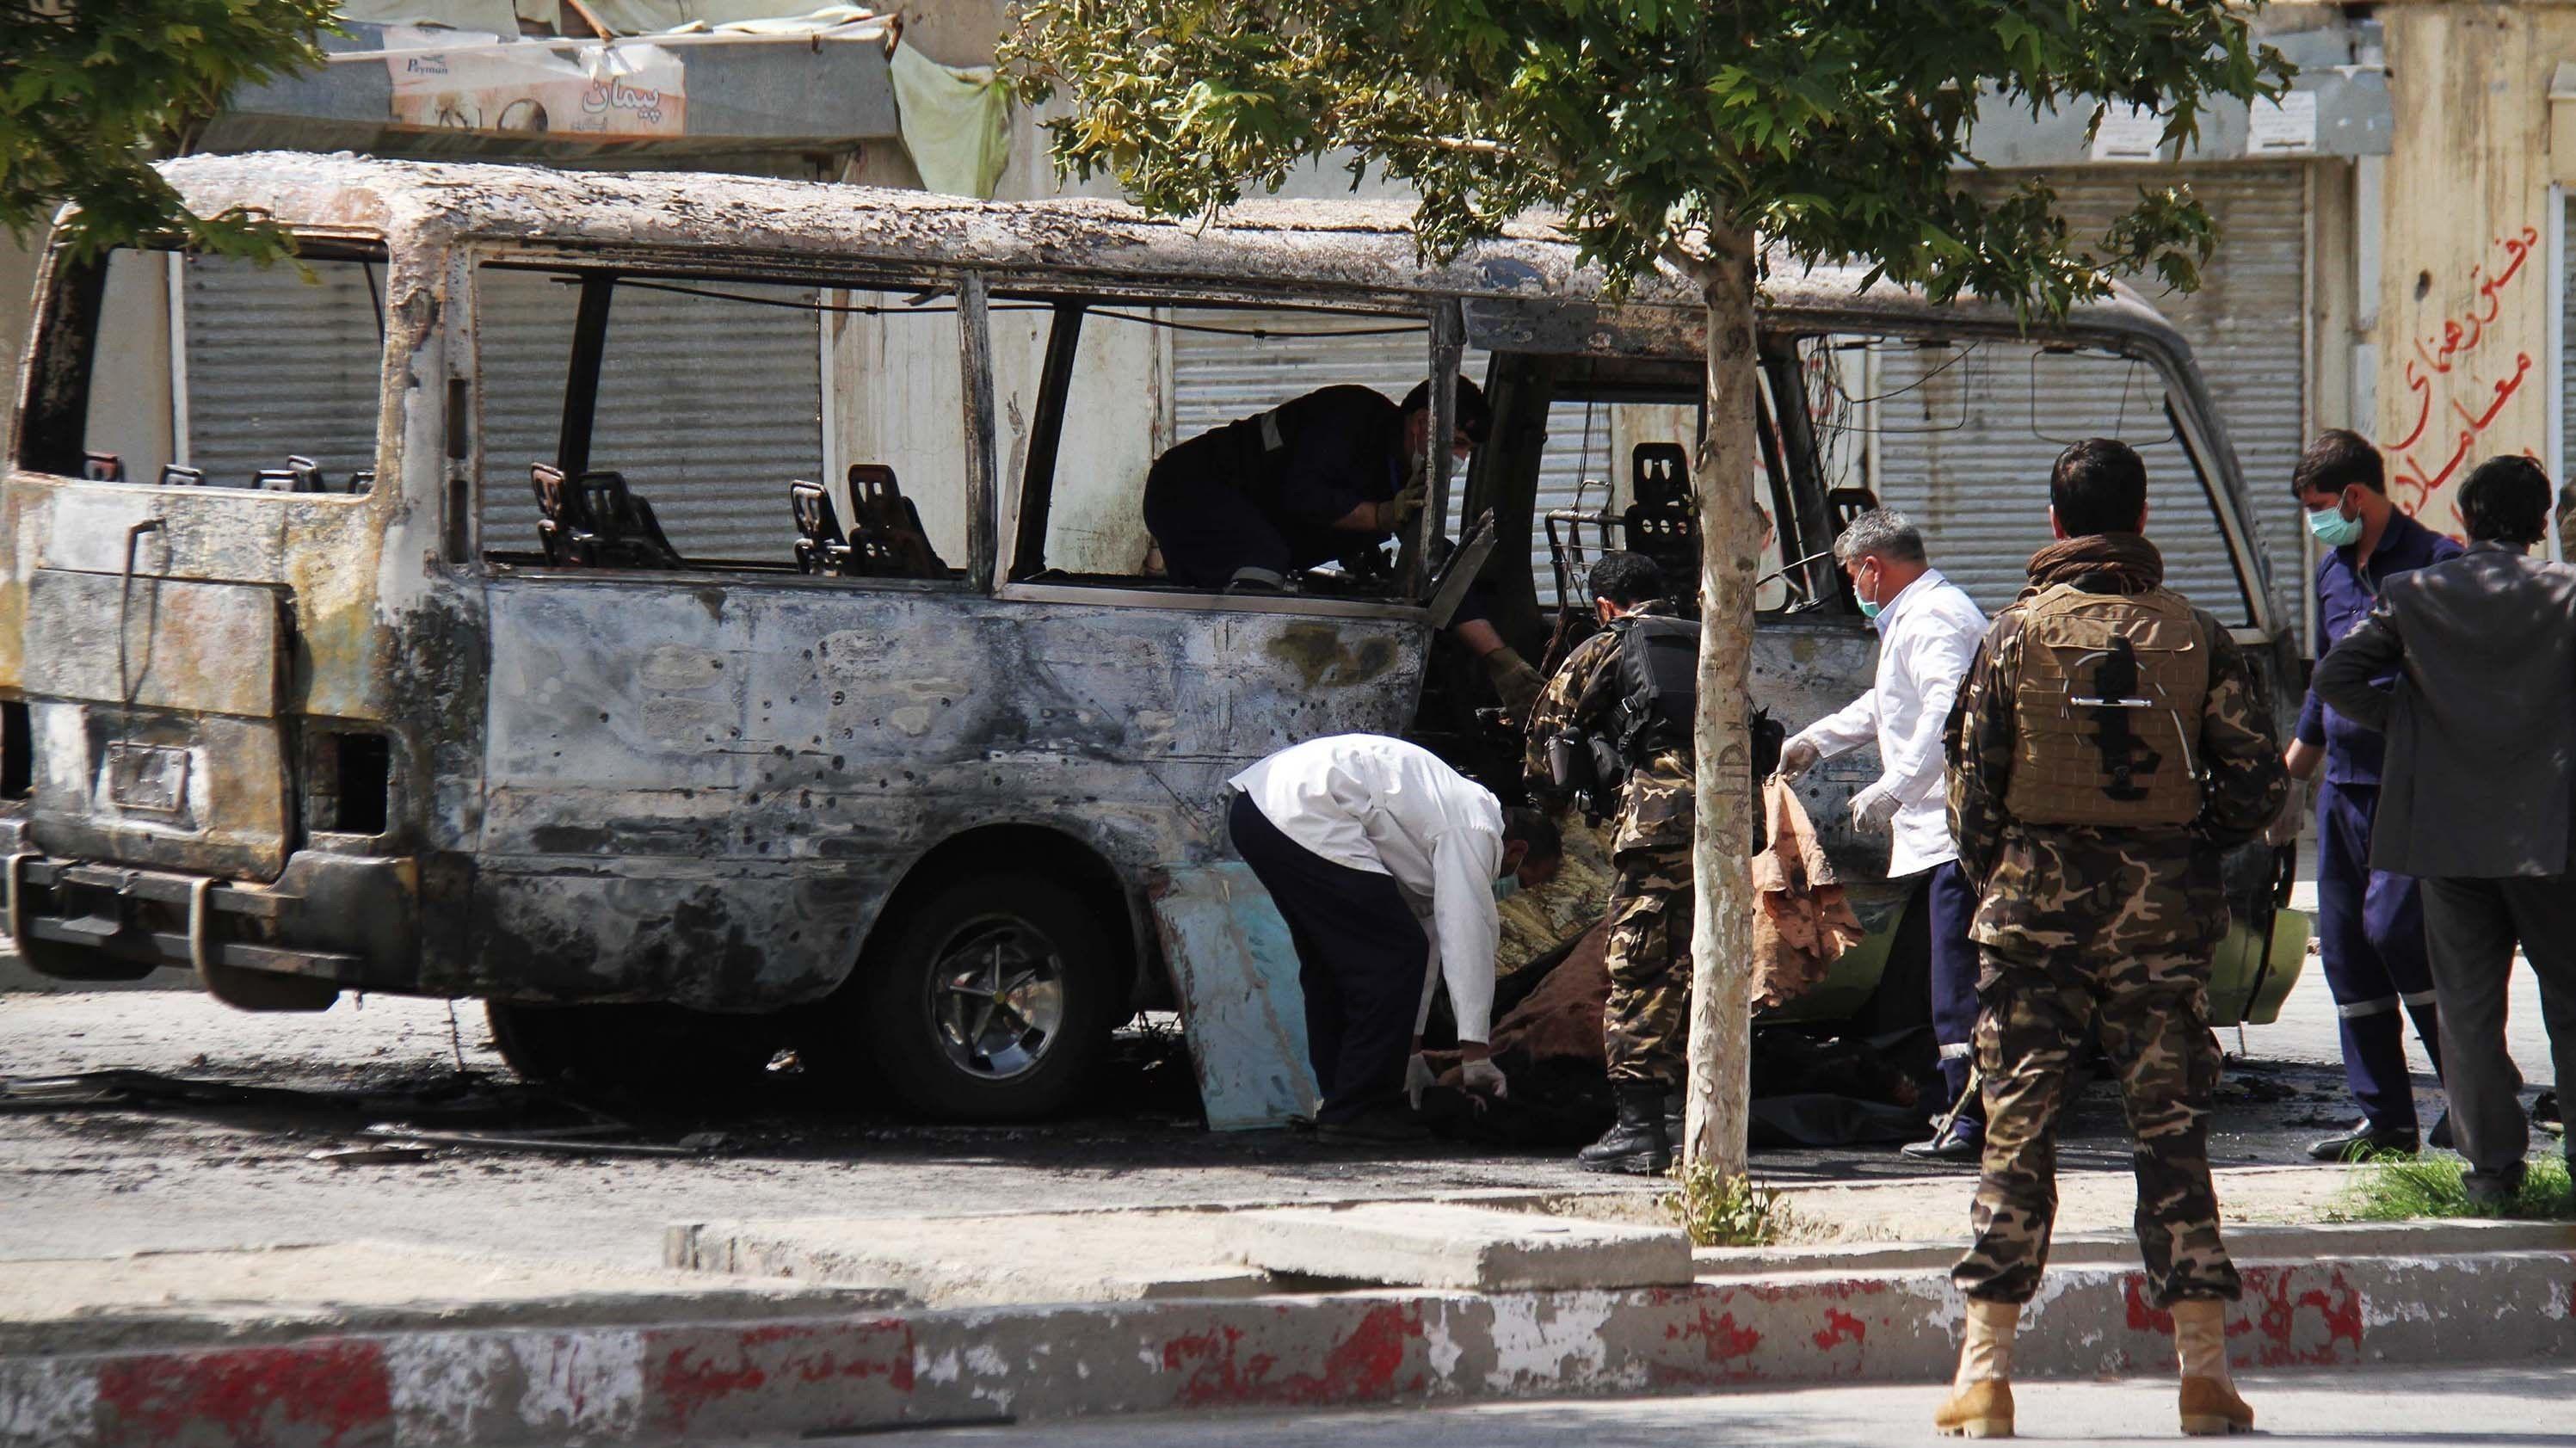 Bombenanschlag in Kabul am 3. Juni 2019 mit mindestens neun Toten.